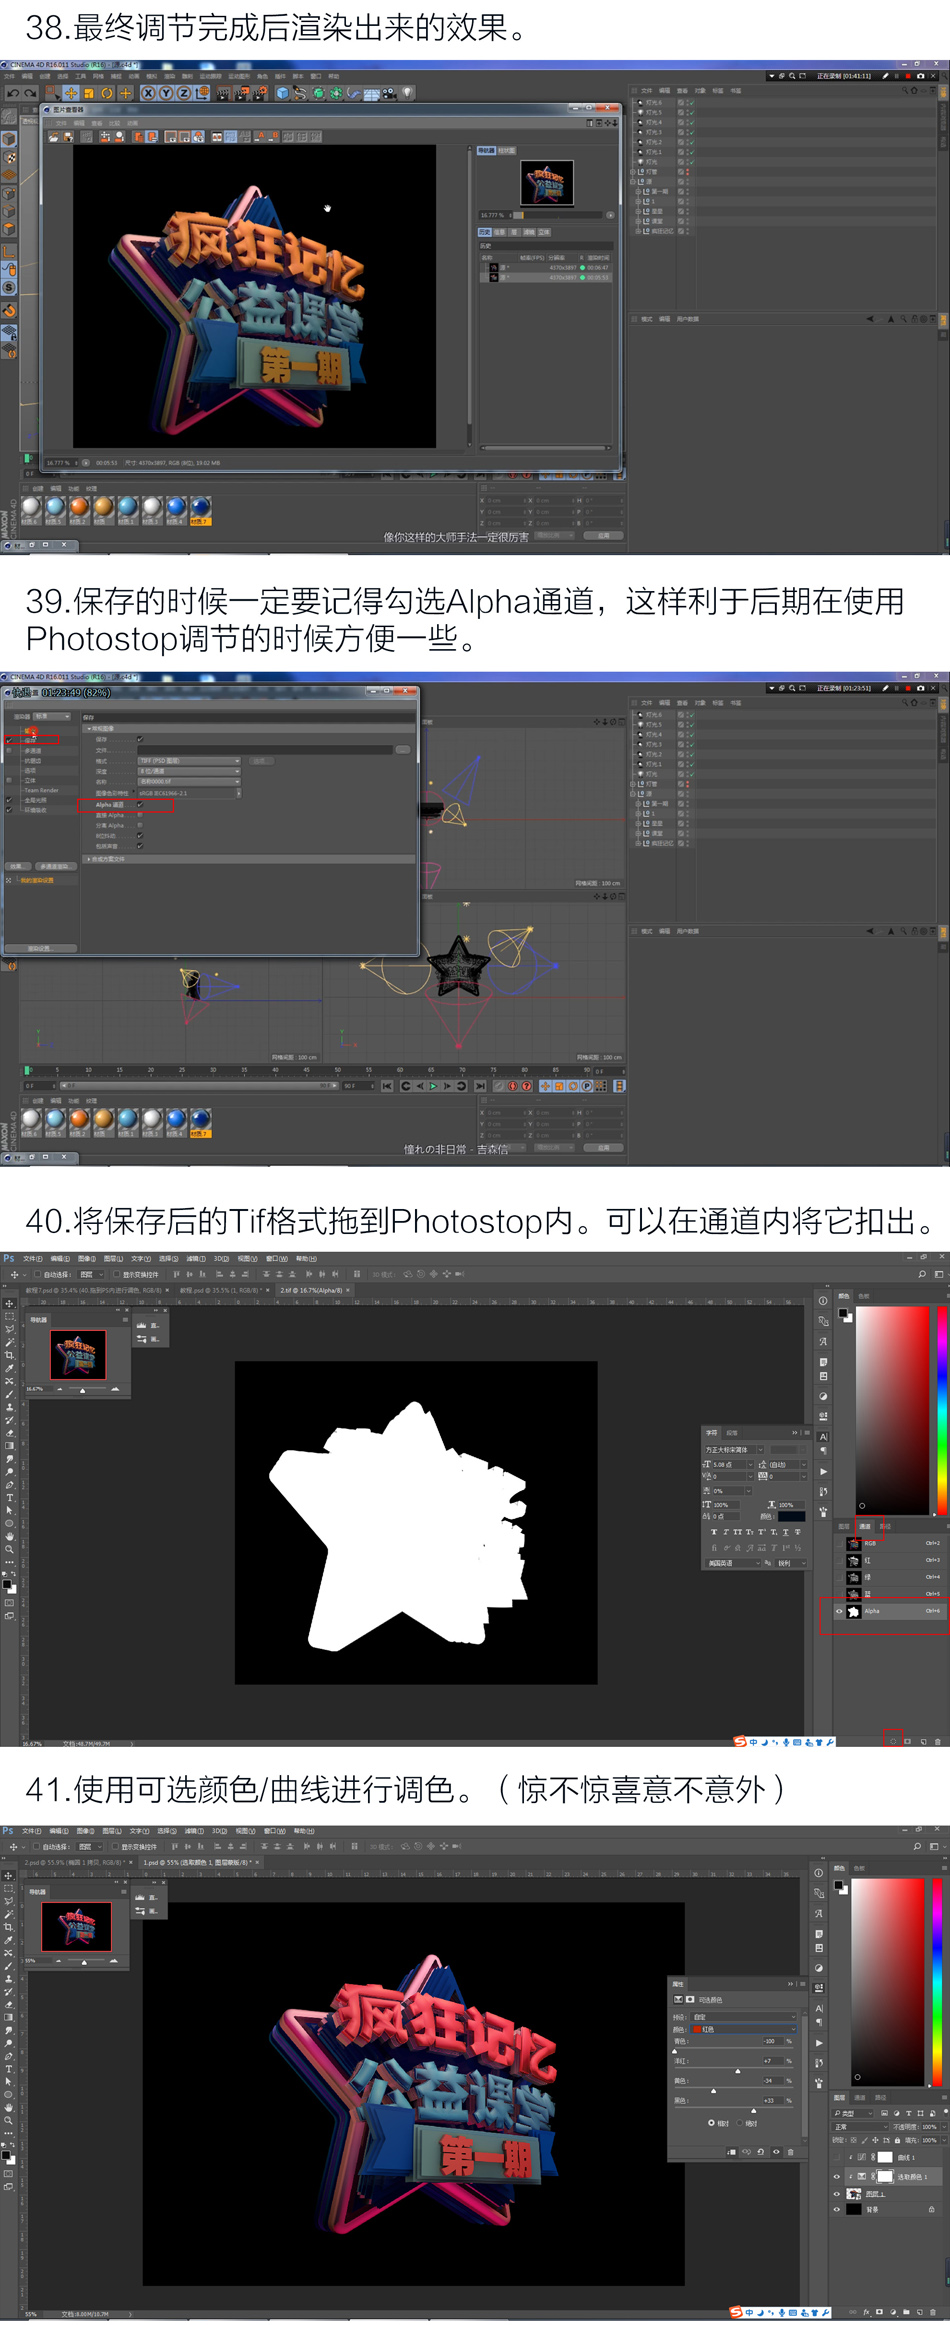 Photoshop結合C4D軟件製作絢麗的立體字